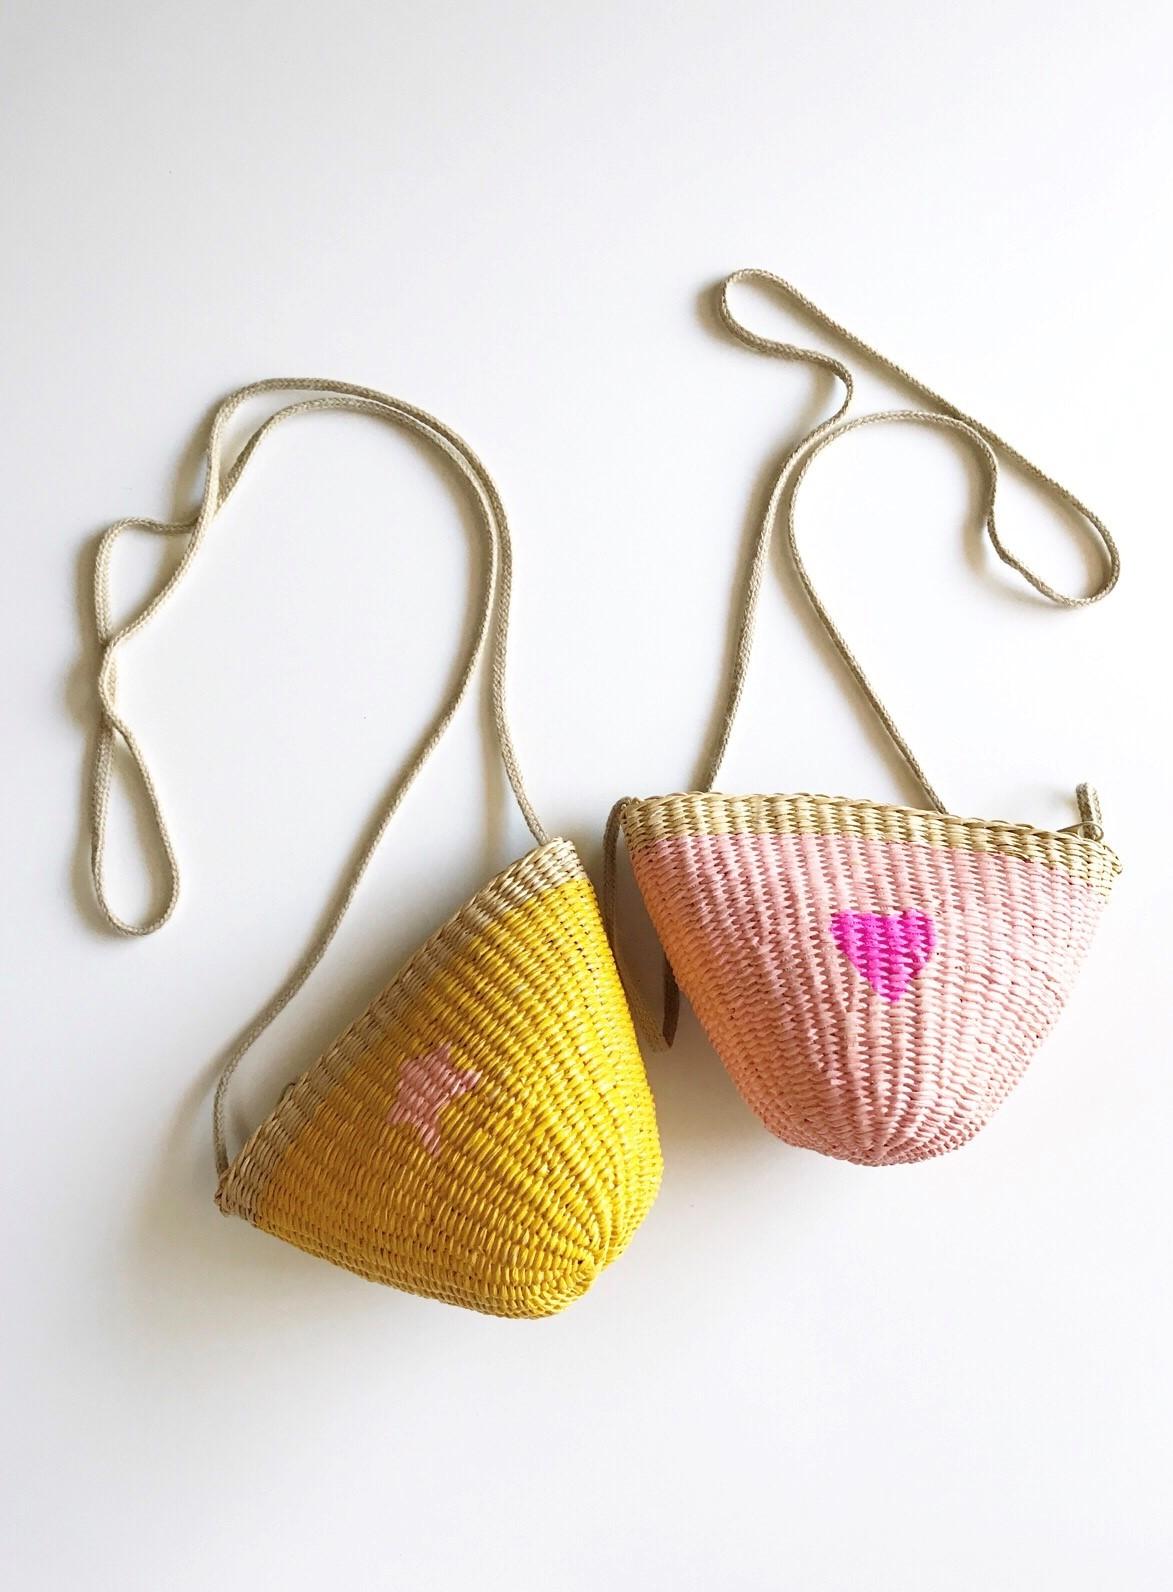 cómo pintar bolsos de paja para niiñas